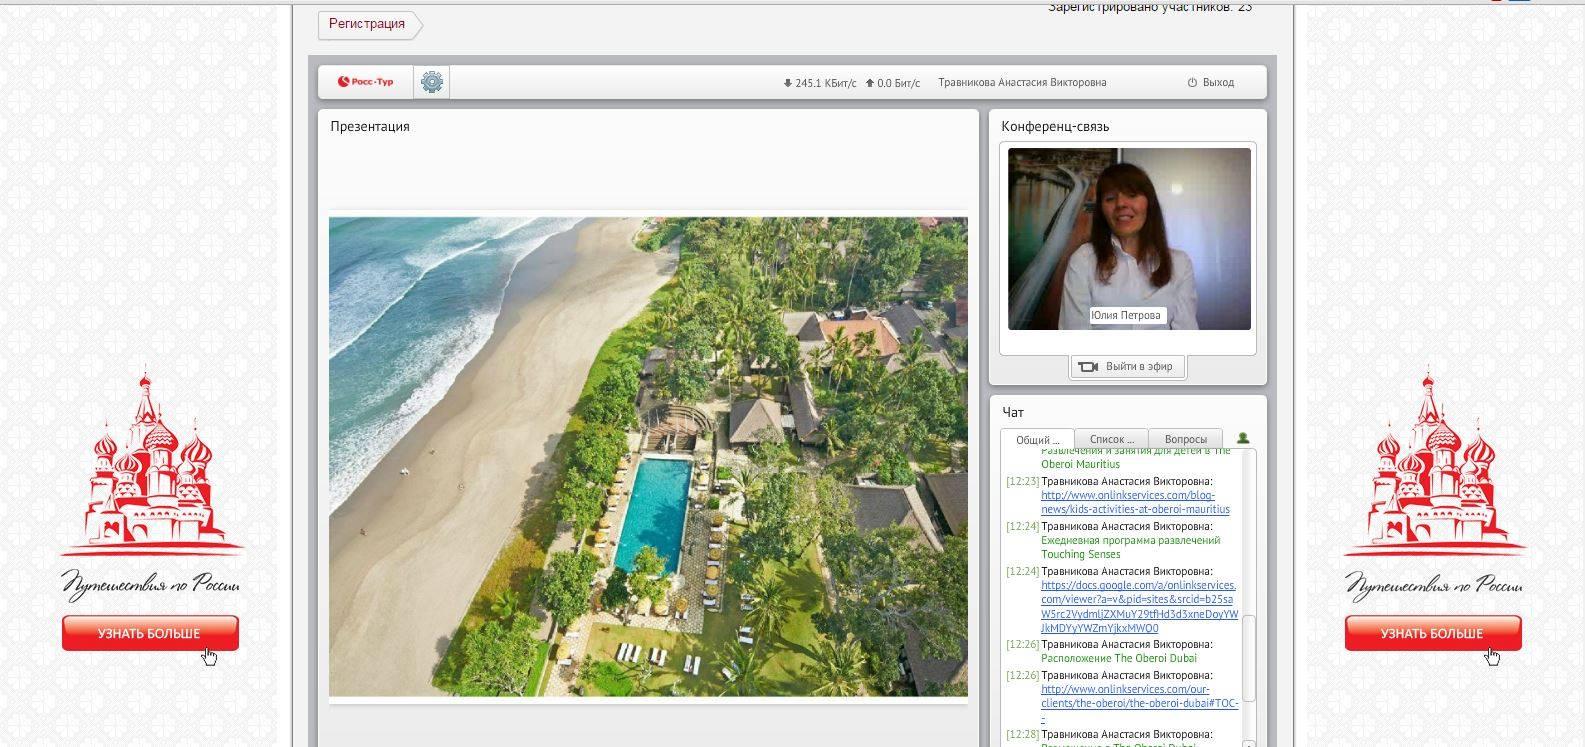 Webinars Onlink Services (4)